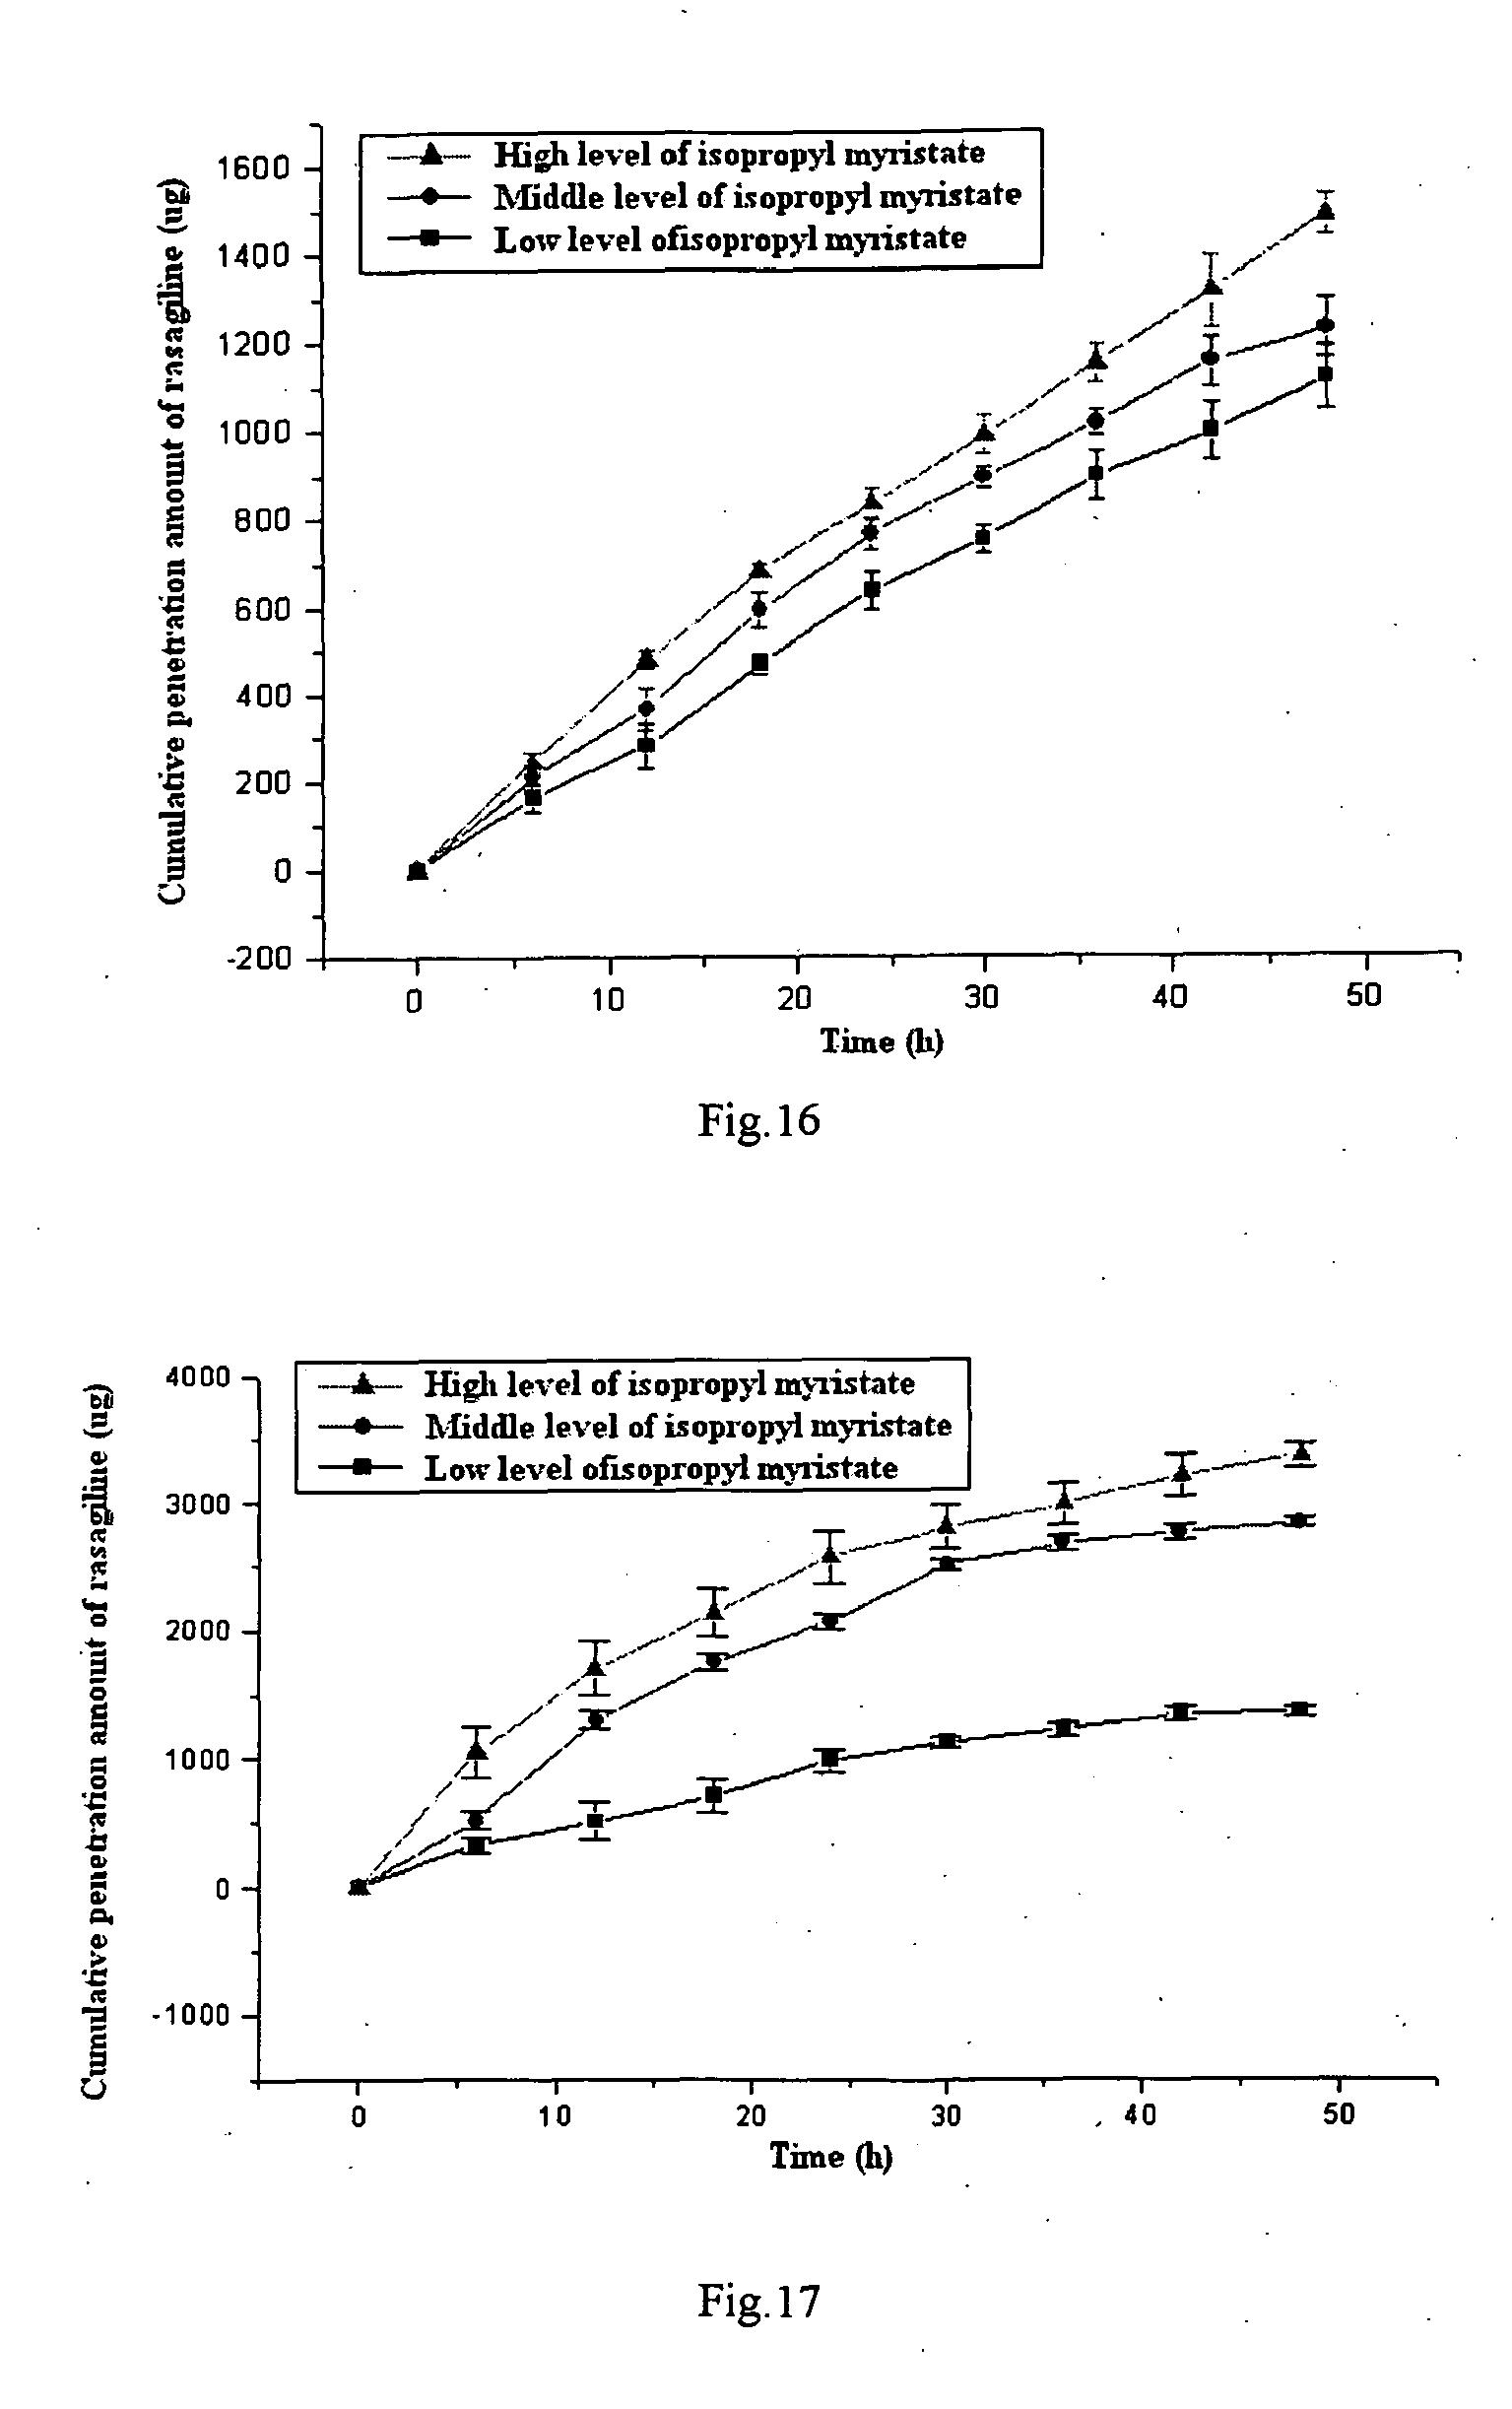 patent ep2011488a1 transdermales pflaster mit rasagilin zur behandlung oder prophylaxe von. Black Bedroom Furniture Sets. Home Design Ideas